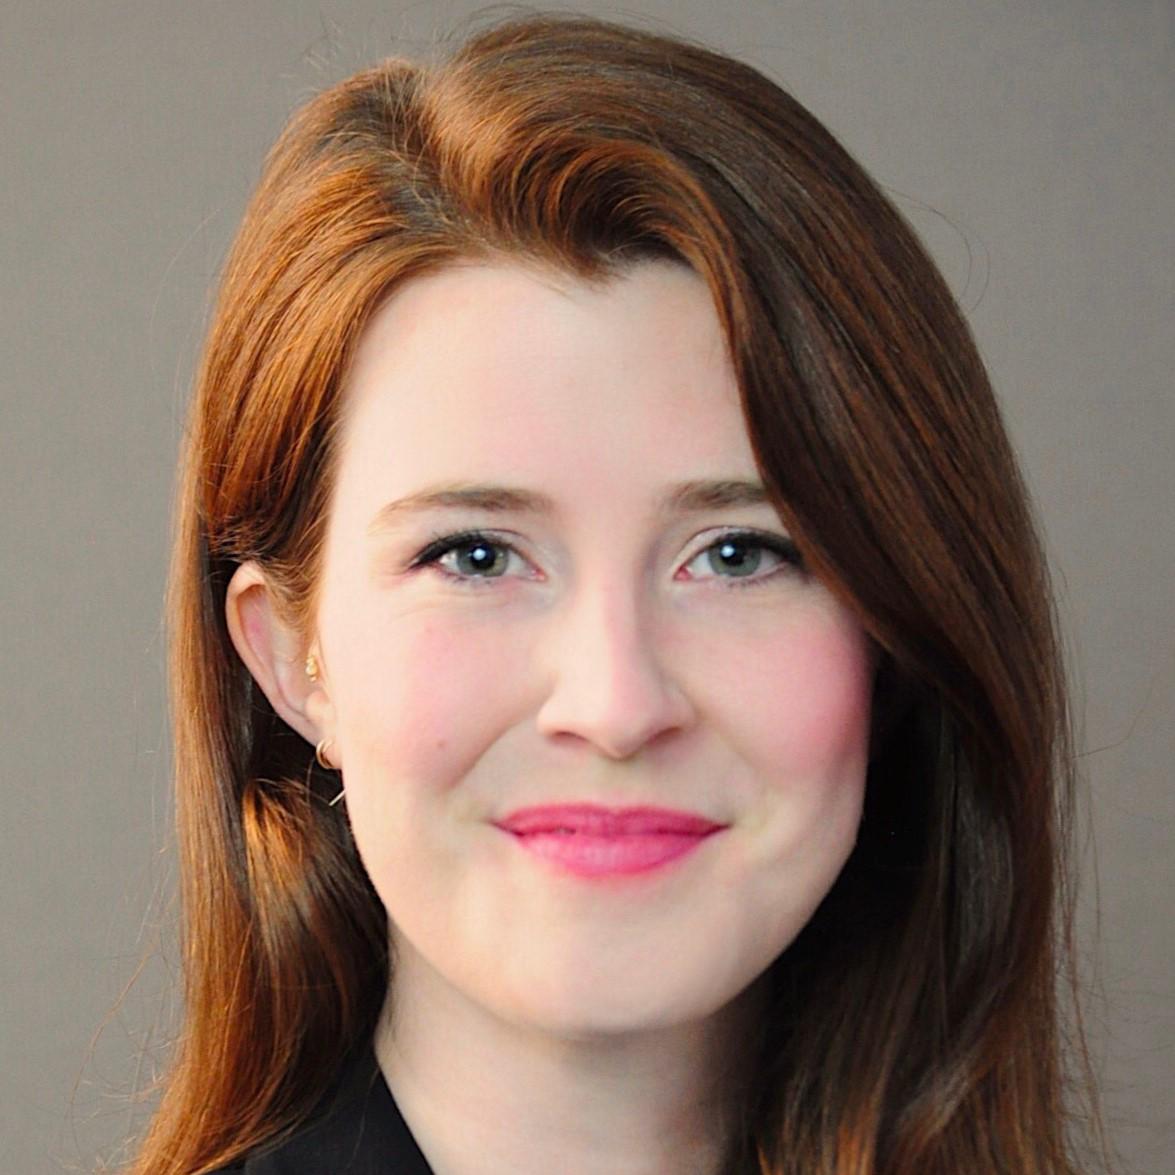 Tess O'Meara